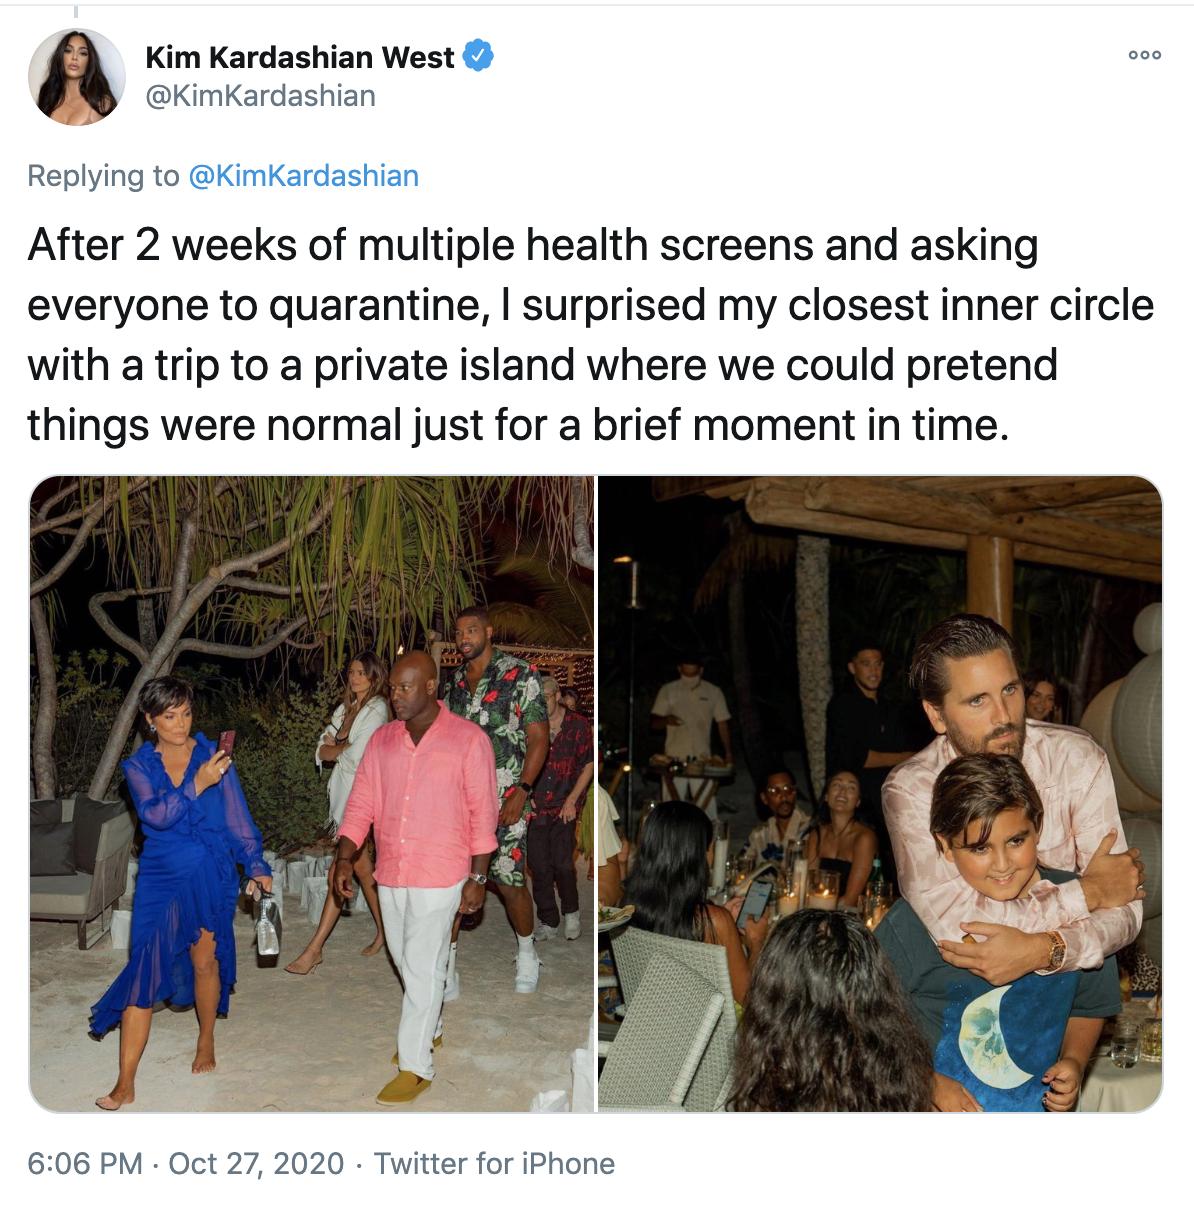 Khloe Kardashian confirms coronavirus diagnosis in Keeping Up with the Kardashians teaser